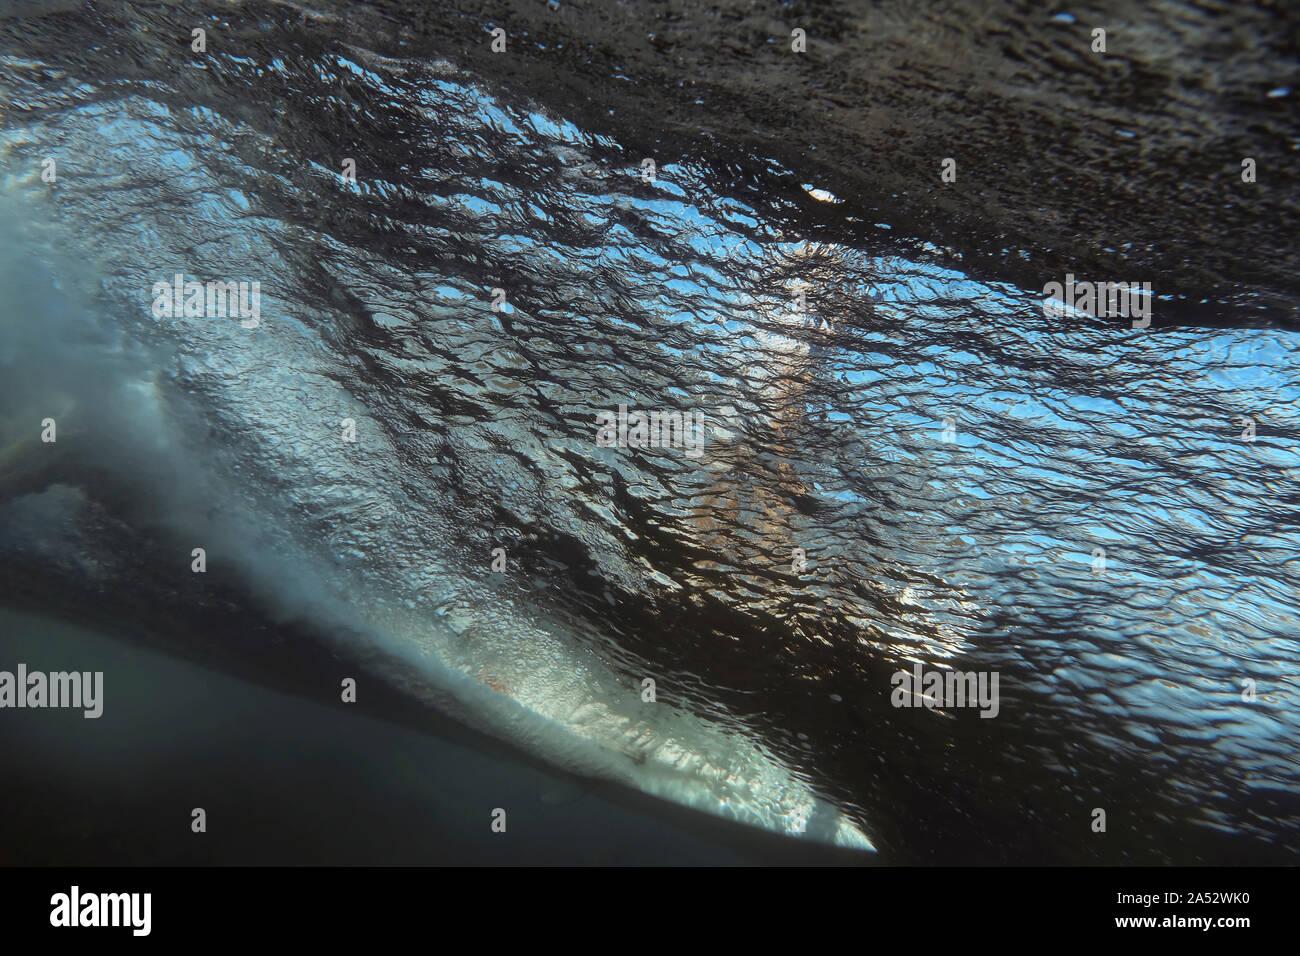 Bajo el agua vista de onda, navegante de surfboard, Sumbawa, Indonesia Foto de stock